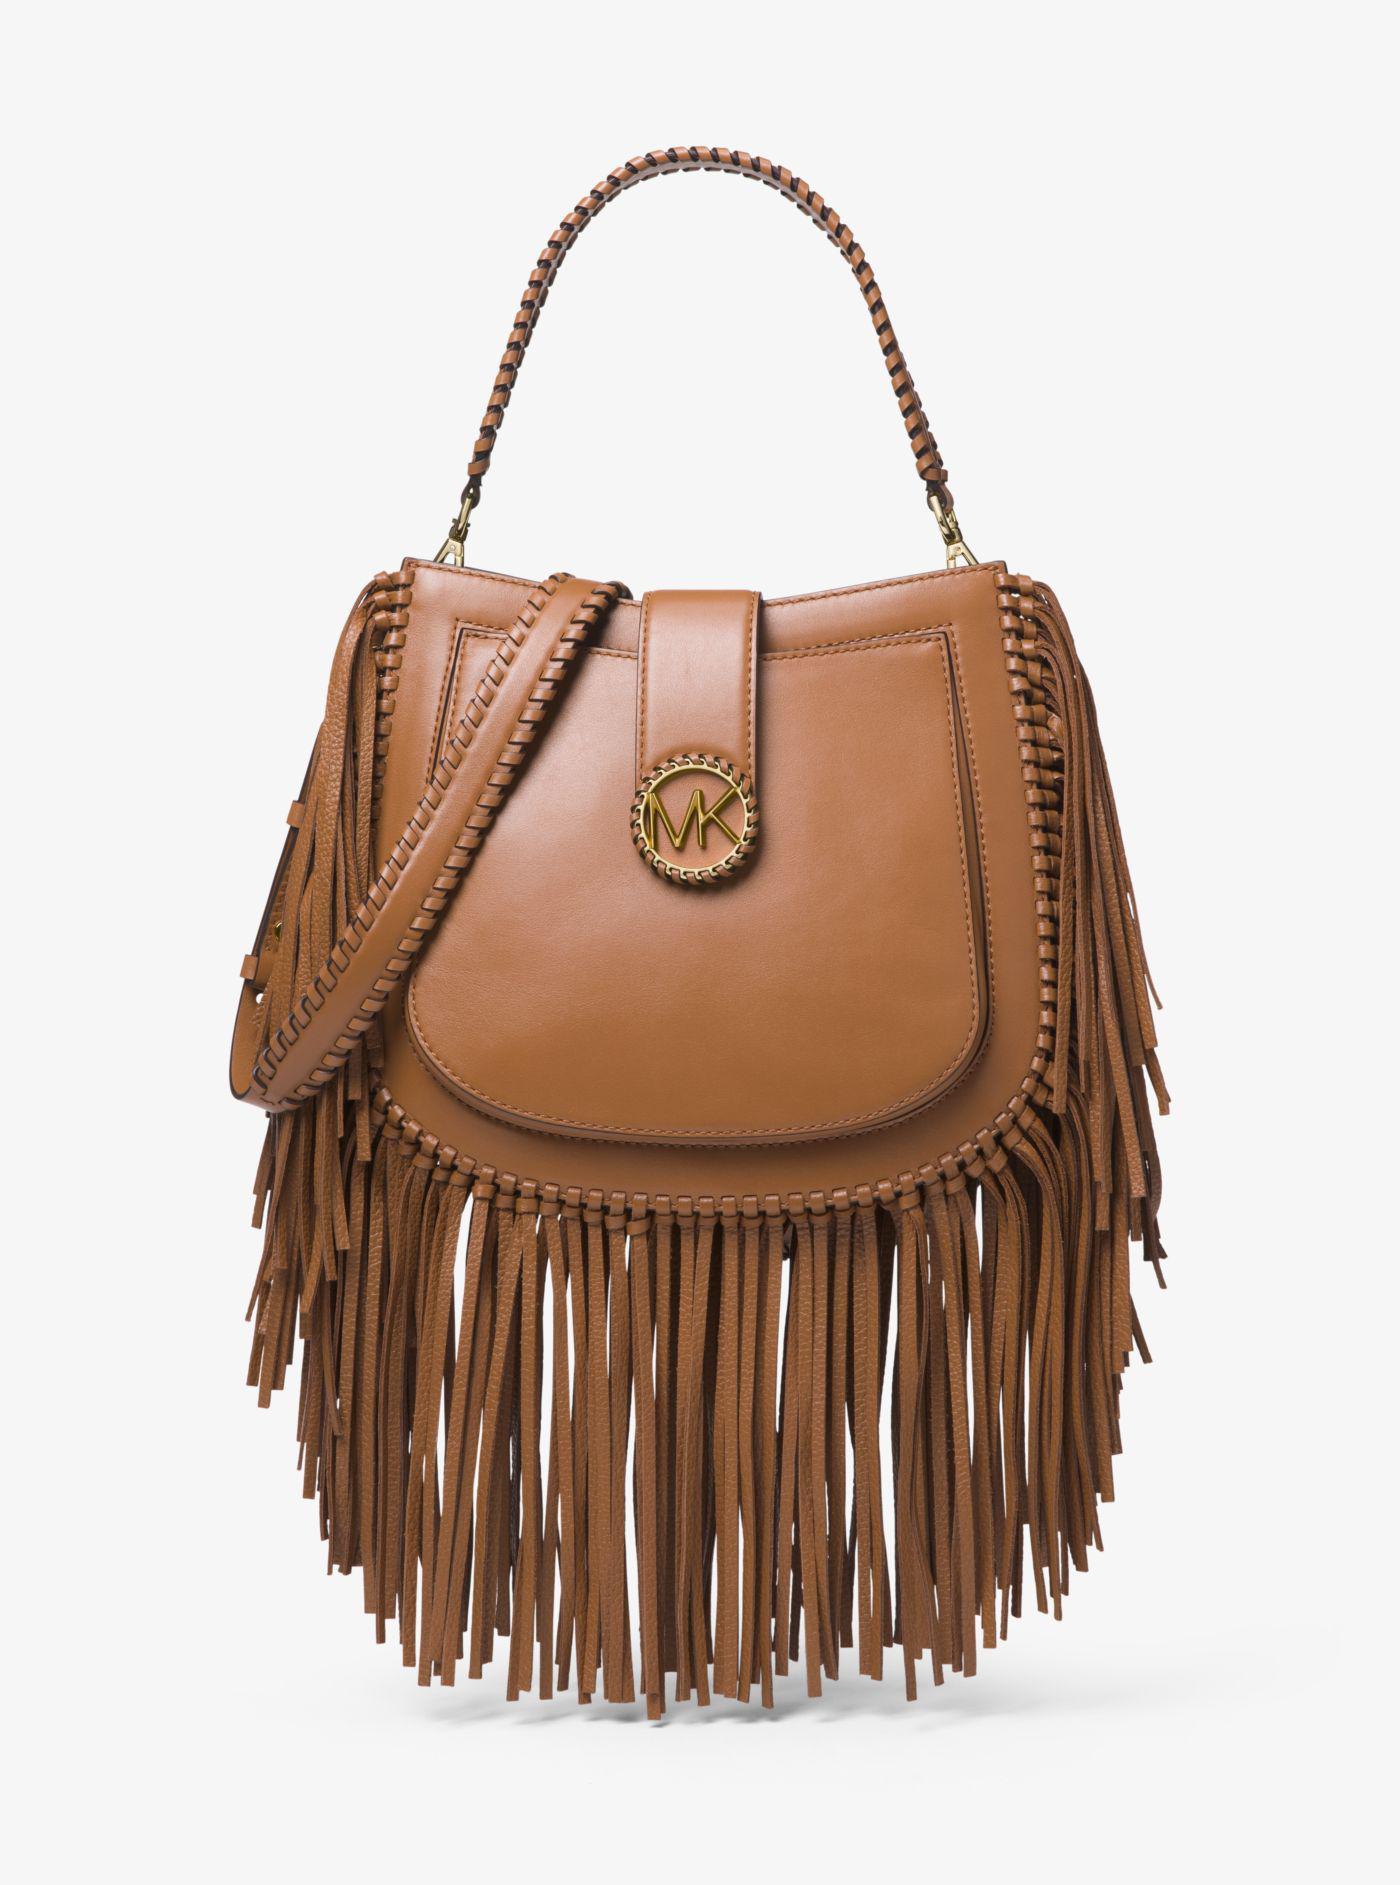 8c2c813dd76e1 ... germany lyst michael kors lillie medium fringed leather shoulder bag in  brown 28931 026fb